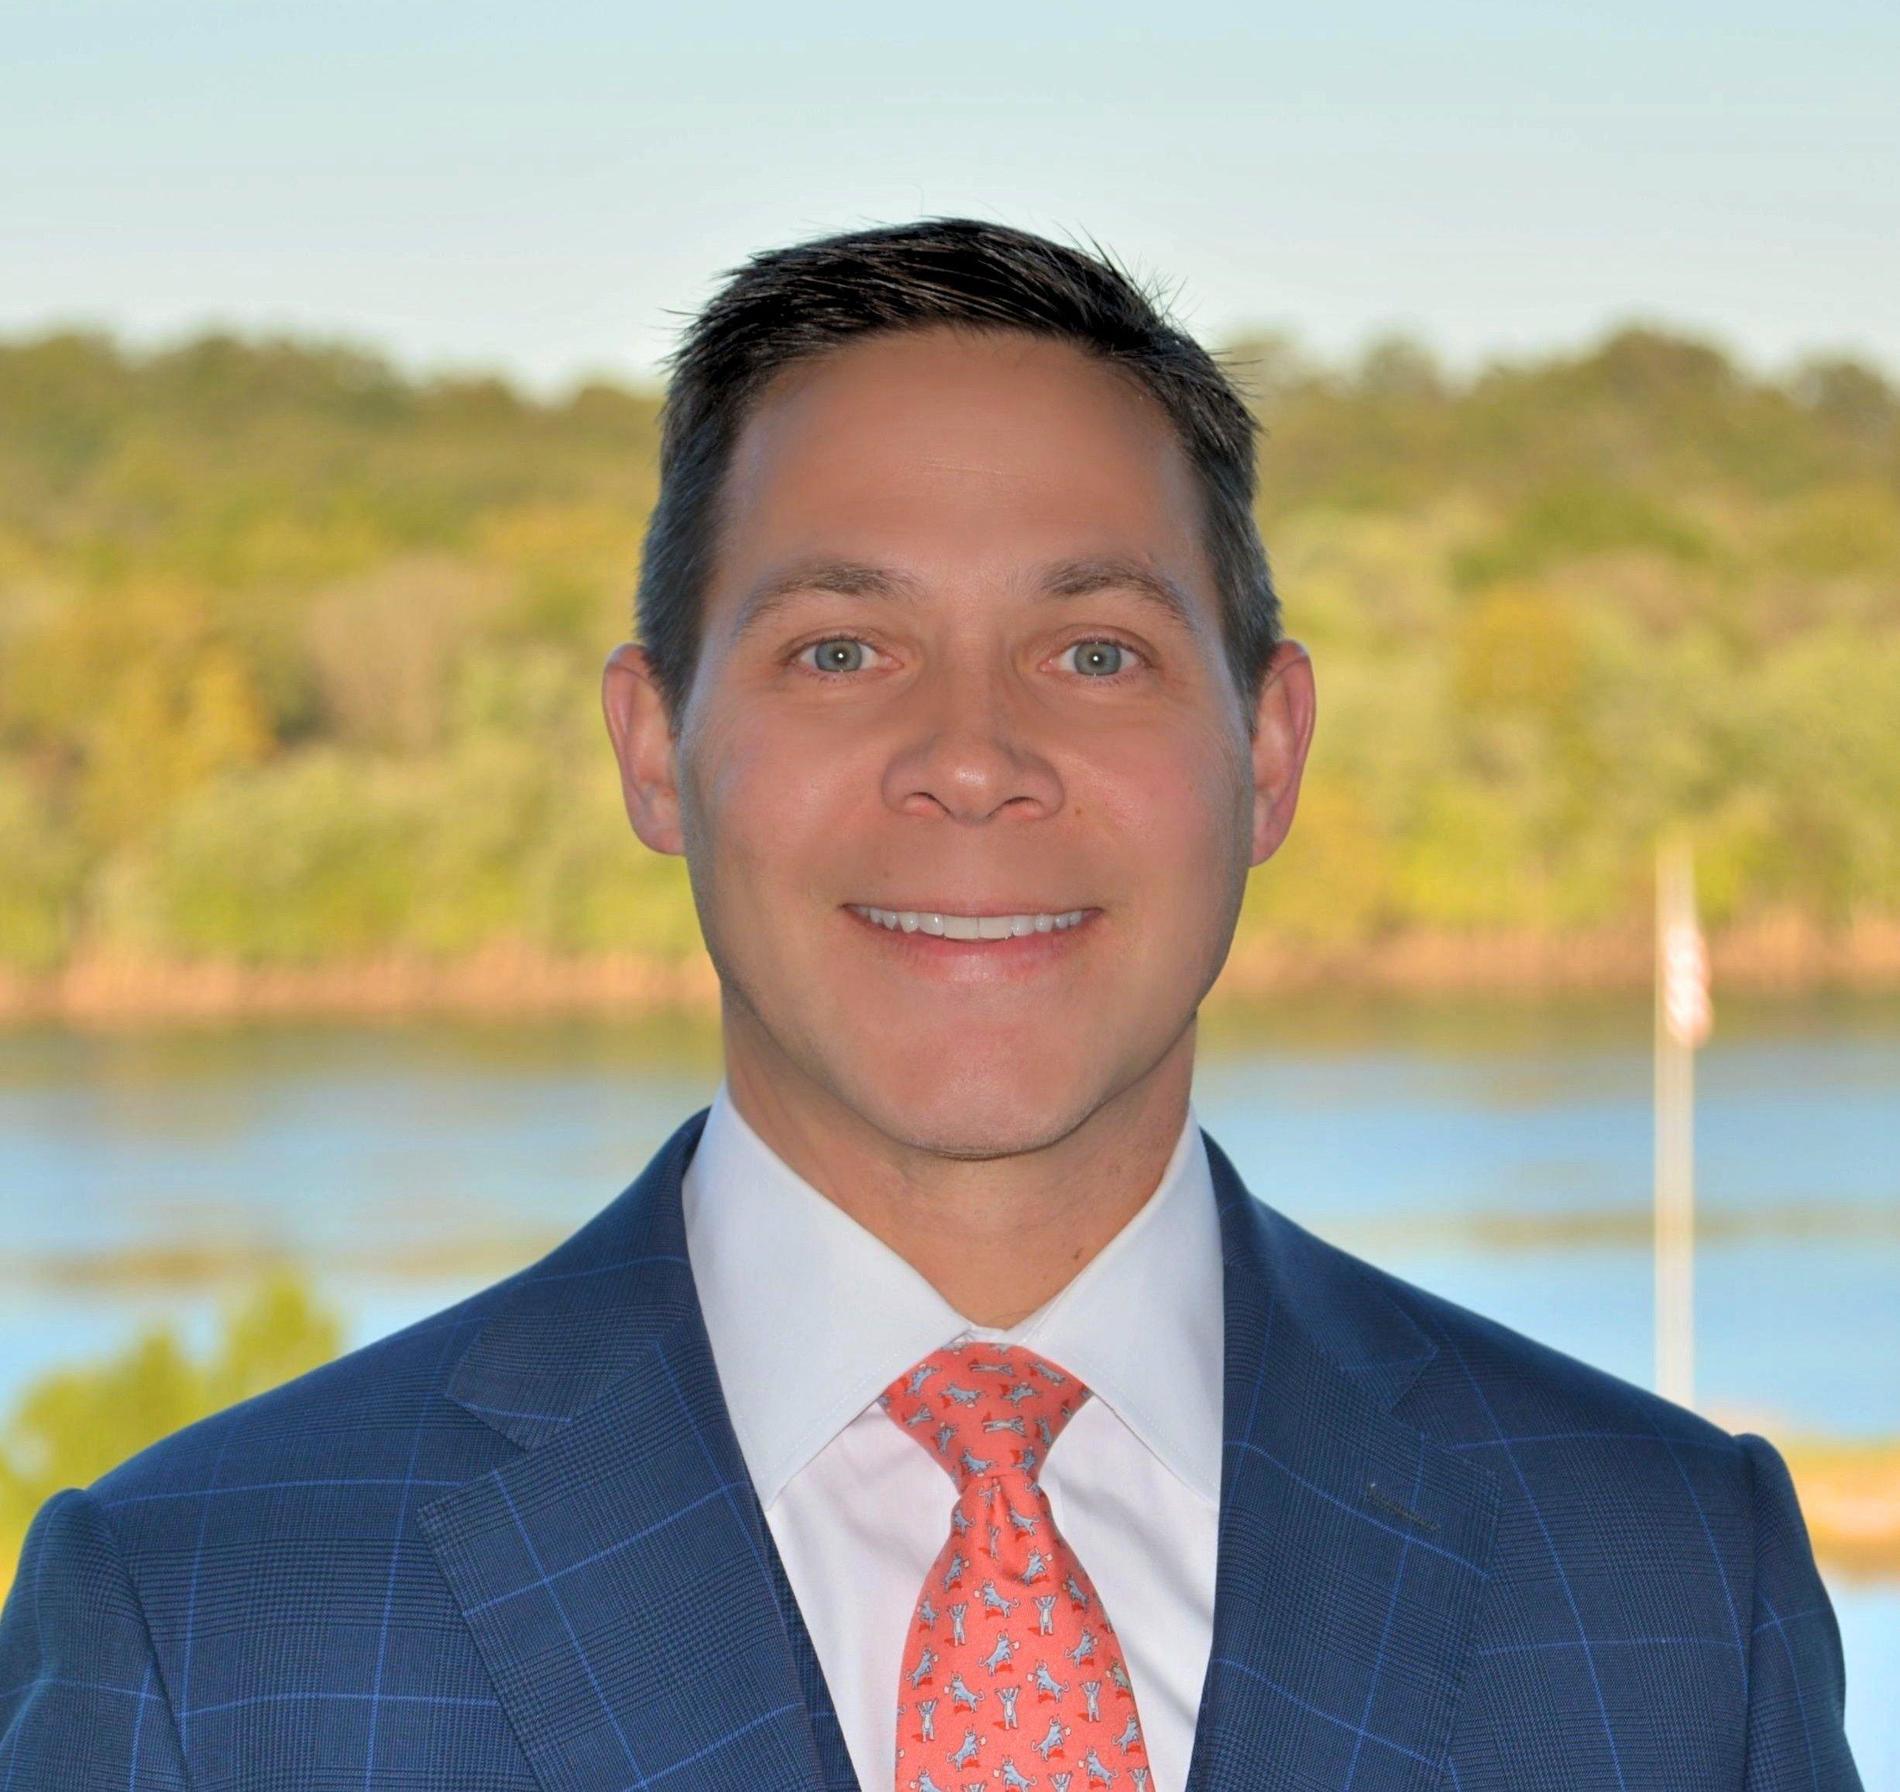 James Avery Merritt | McLean, VA | Morgan Stanley Wealth